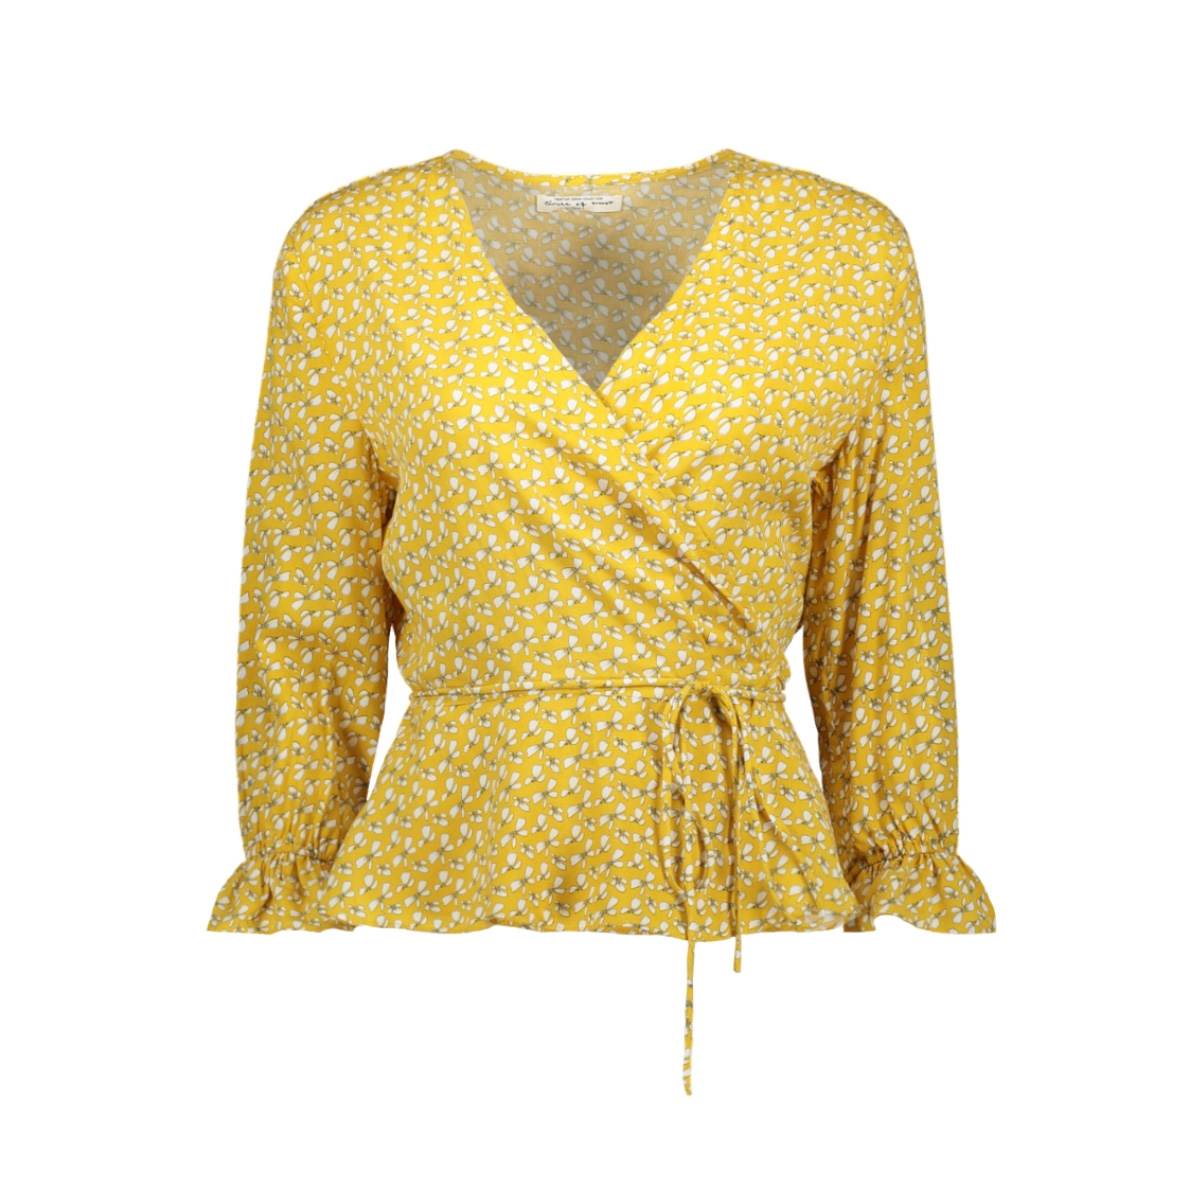 lexi wrap blouse s19 55 circle of trust blouse 2155 sun dark